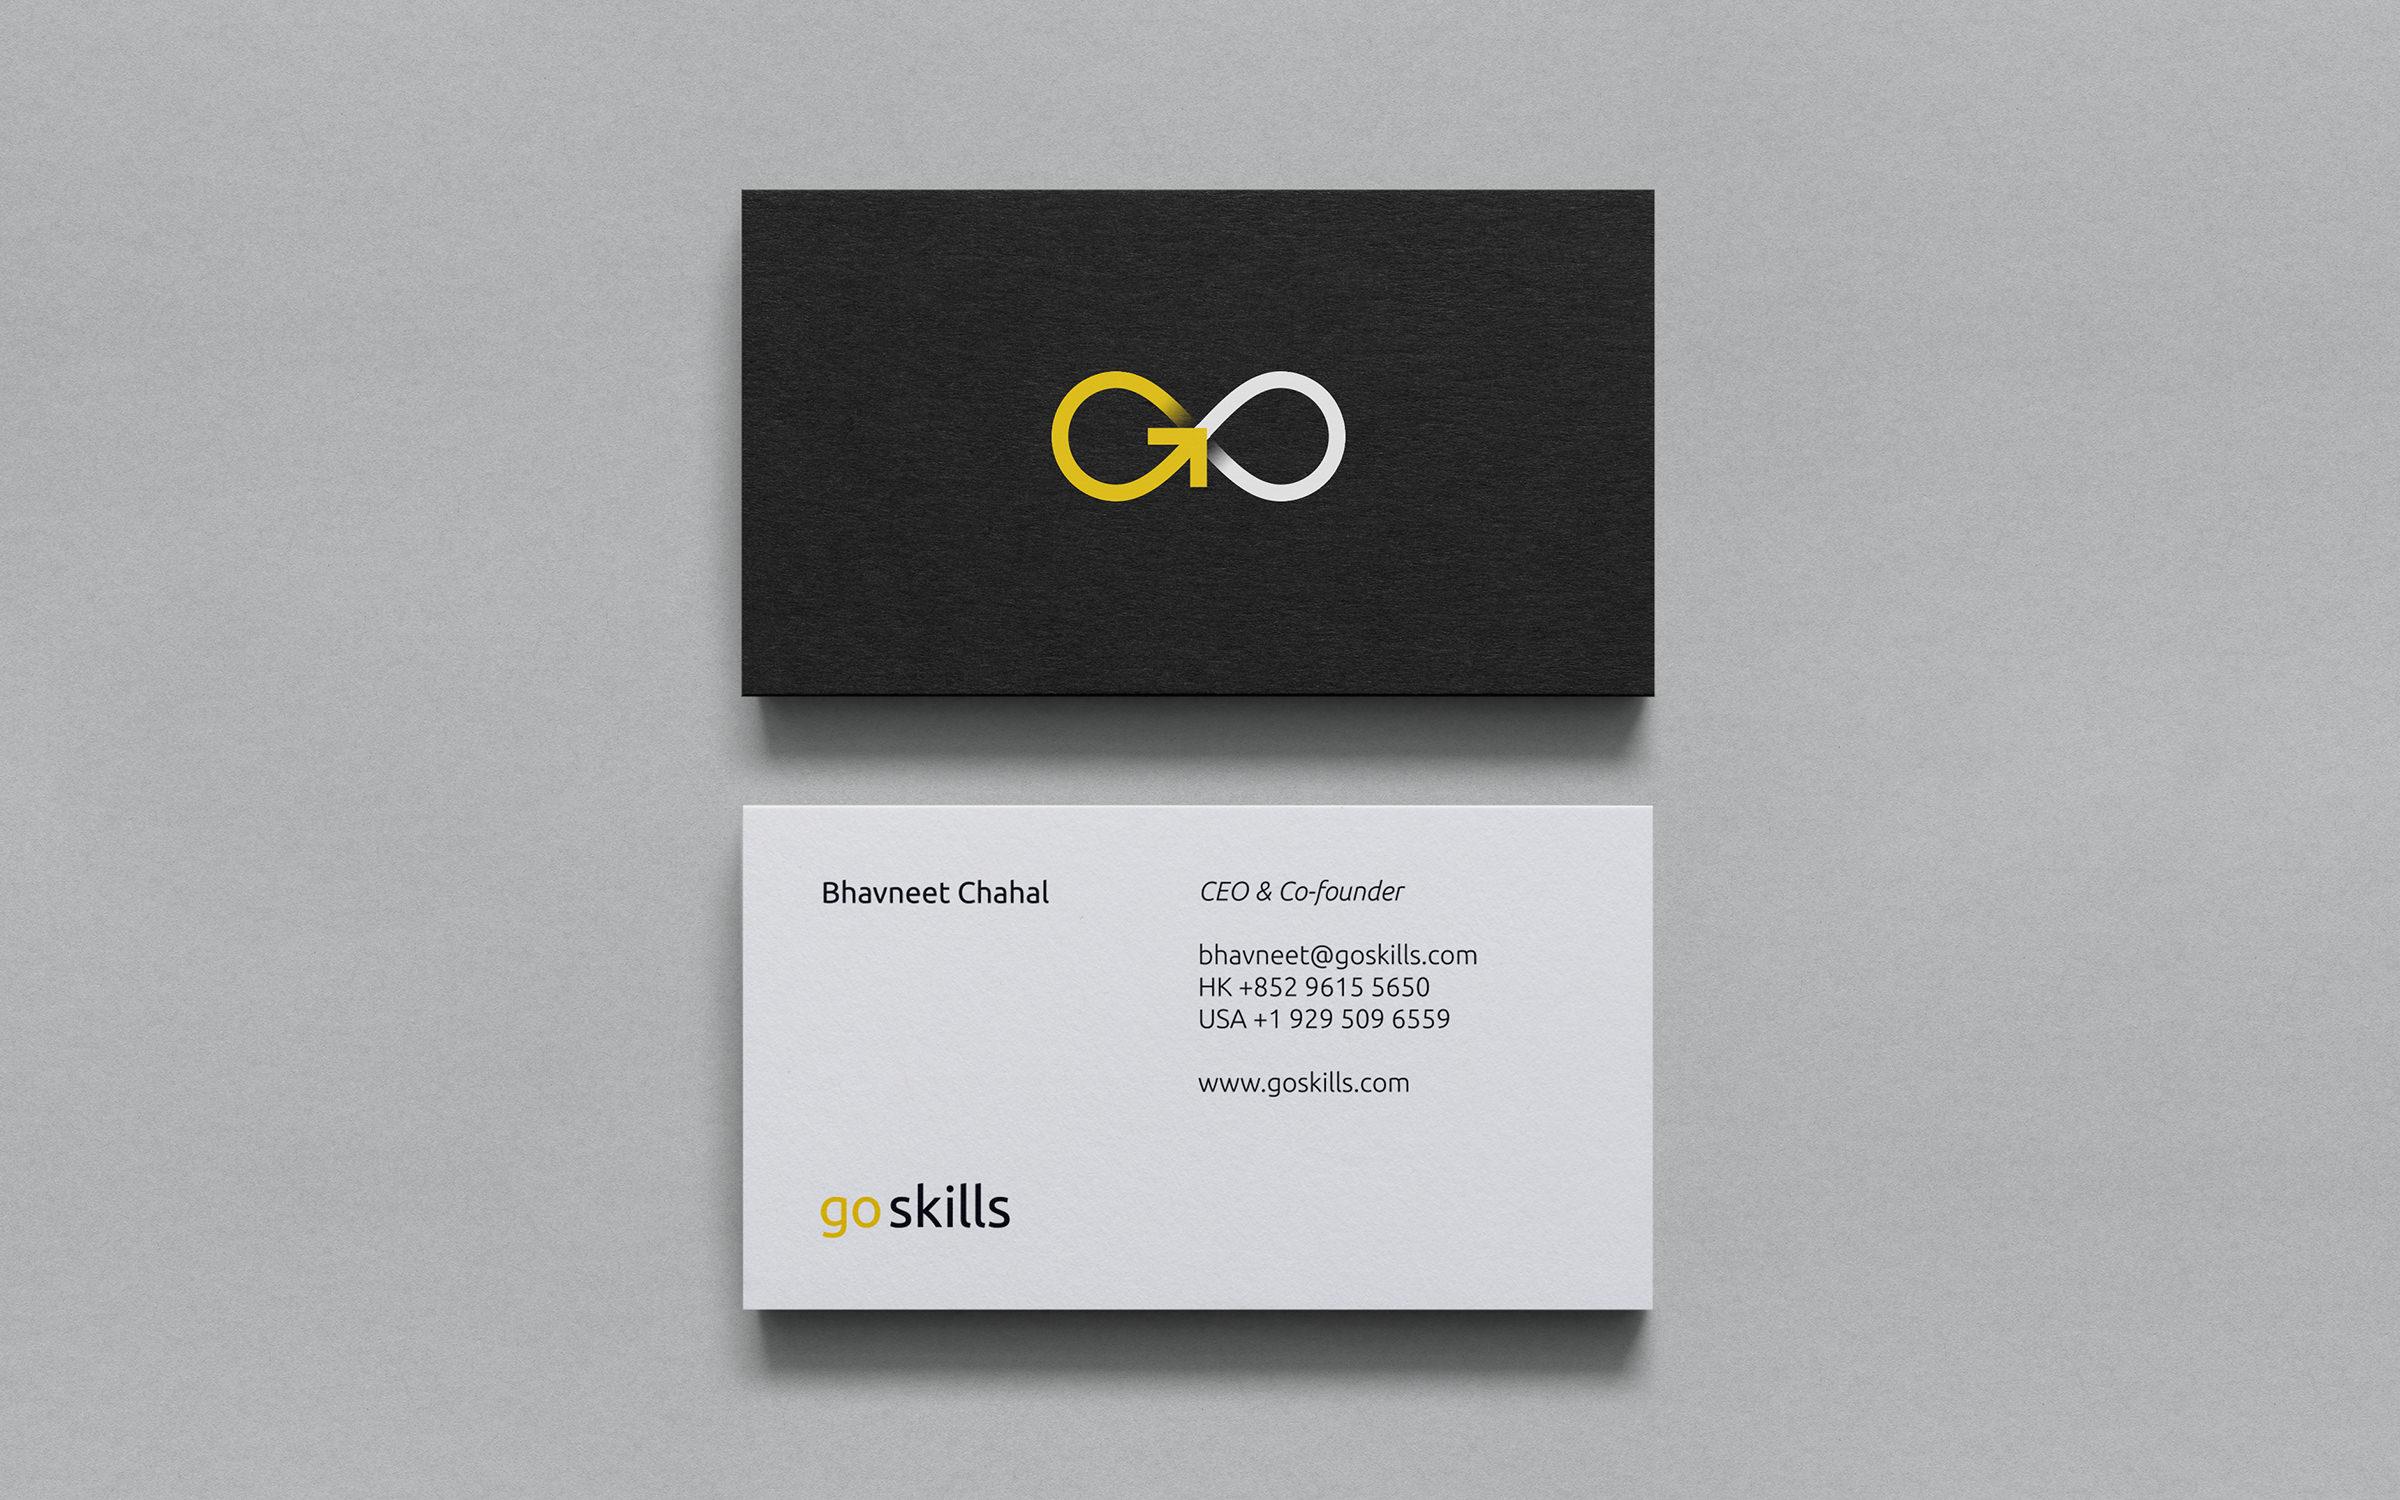 goskills_rebrand_017.jpg